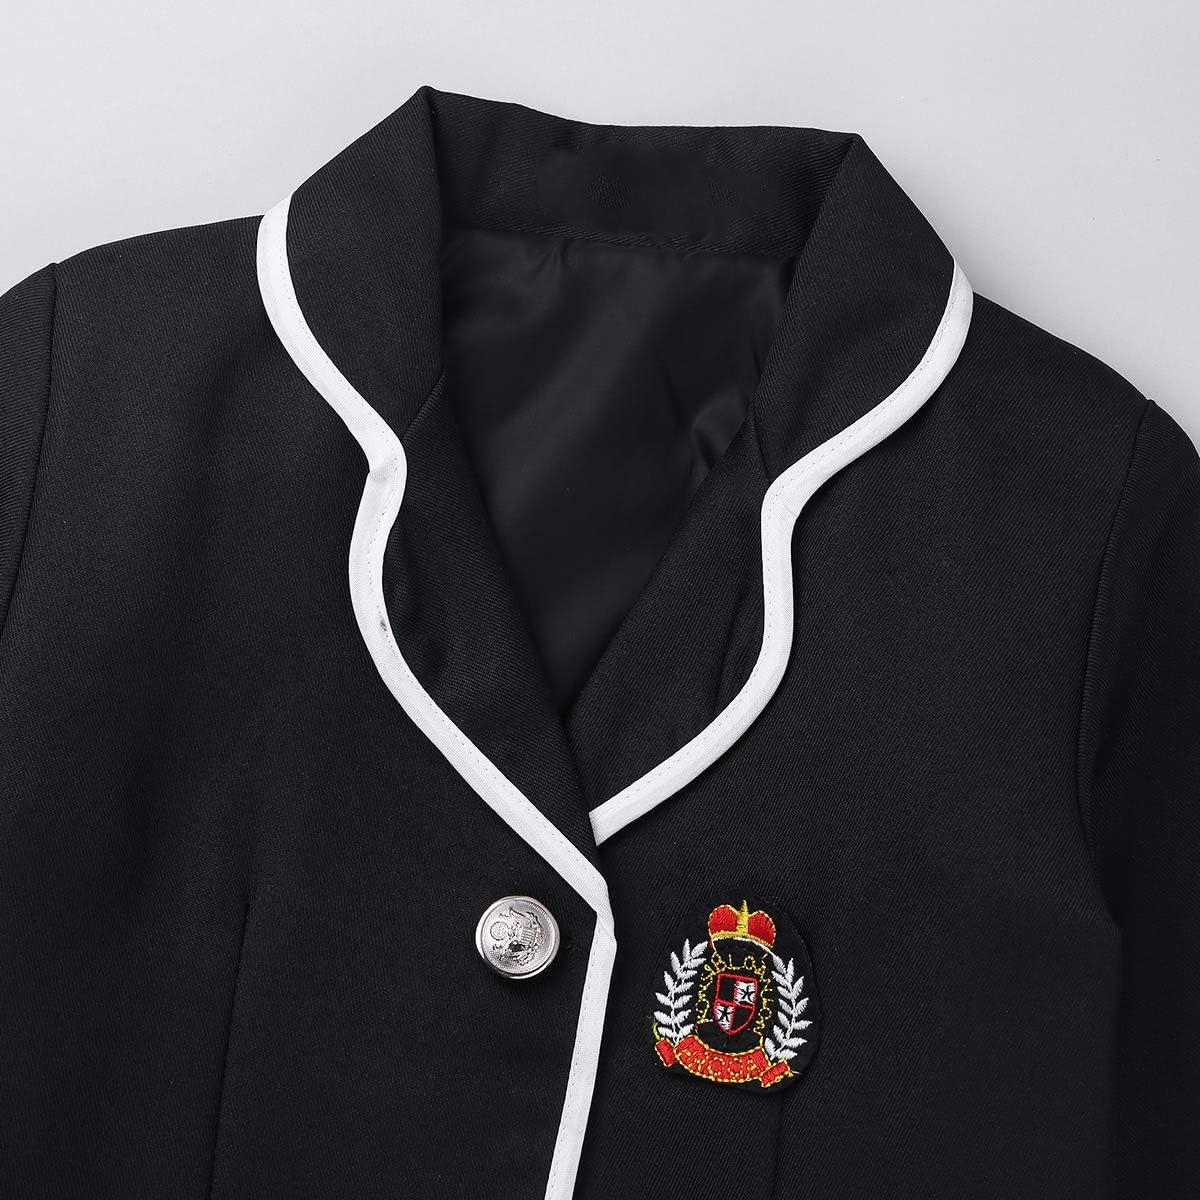 JEEYJOO Kids Girls Anime Cosplay Costume Outfits Long Sleeve Jacket with Shirt Tie Plaid Skirt Set School Uniform